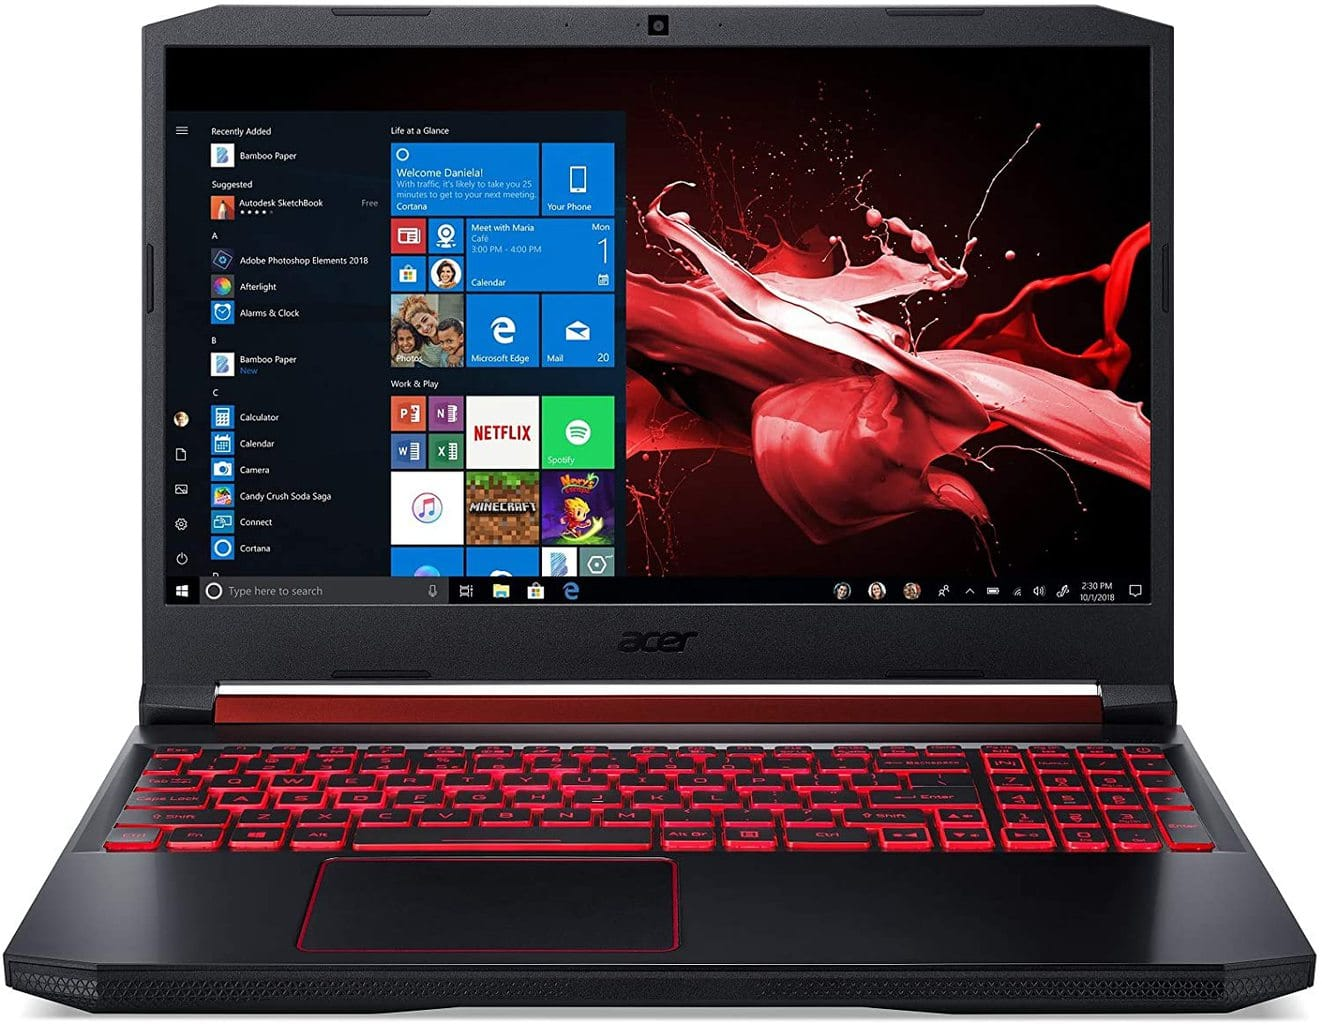 "Acer NITRO 5 AN515-54-5812 GAMING Core i5-9300H 2.4GHz 256GB SSD 8GB 15.6"" (1920x1080) BT WIN10 Webcam NVIDIA GTX 1650 4096MB Backlit Keyboard BLACK ( INTERNATIONAL VERSION )"